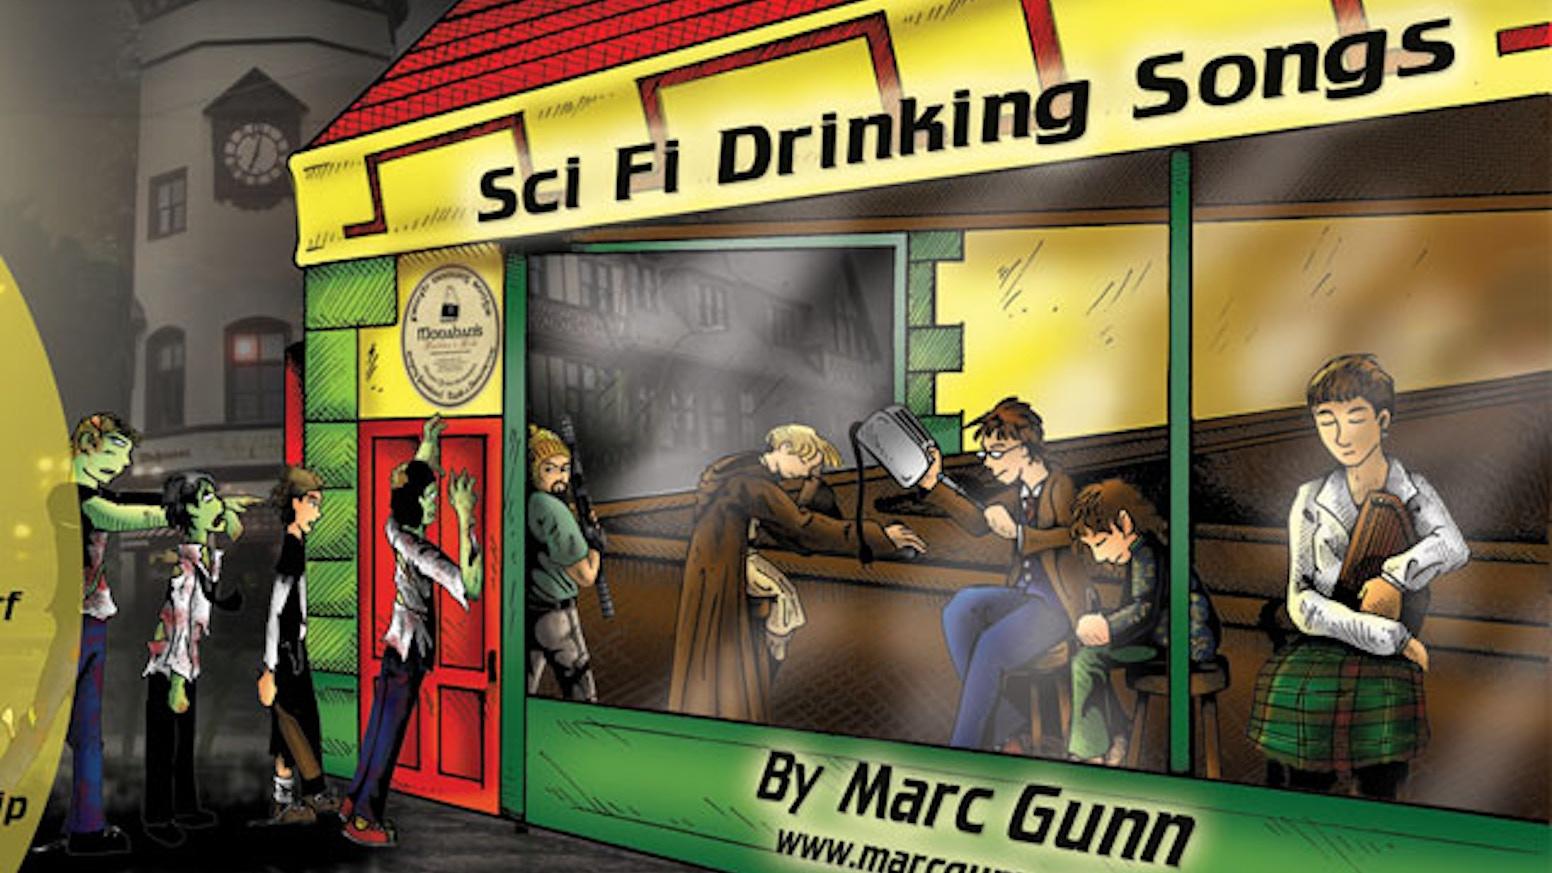 Sci Fi Drinking Songs by Marc Gunn — Kickstarter